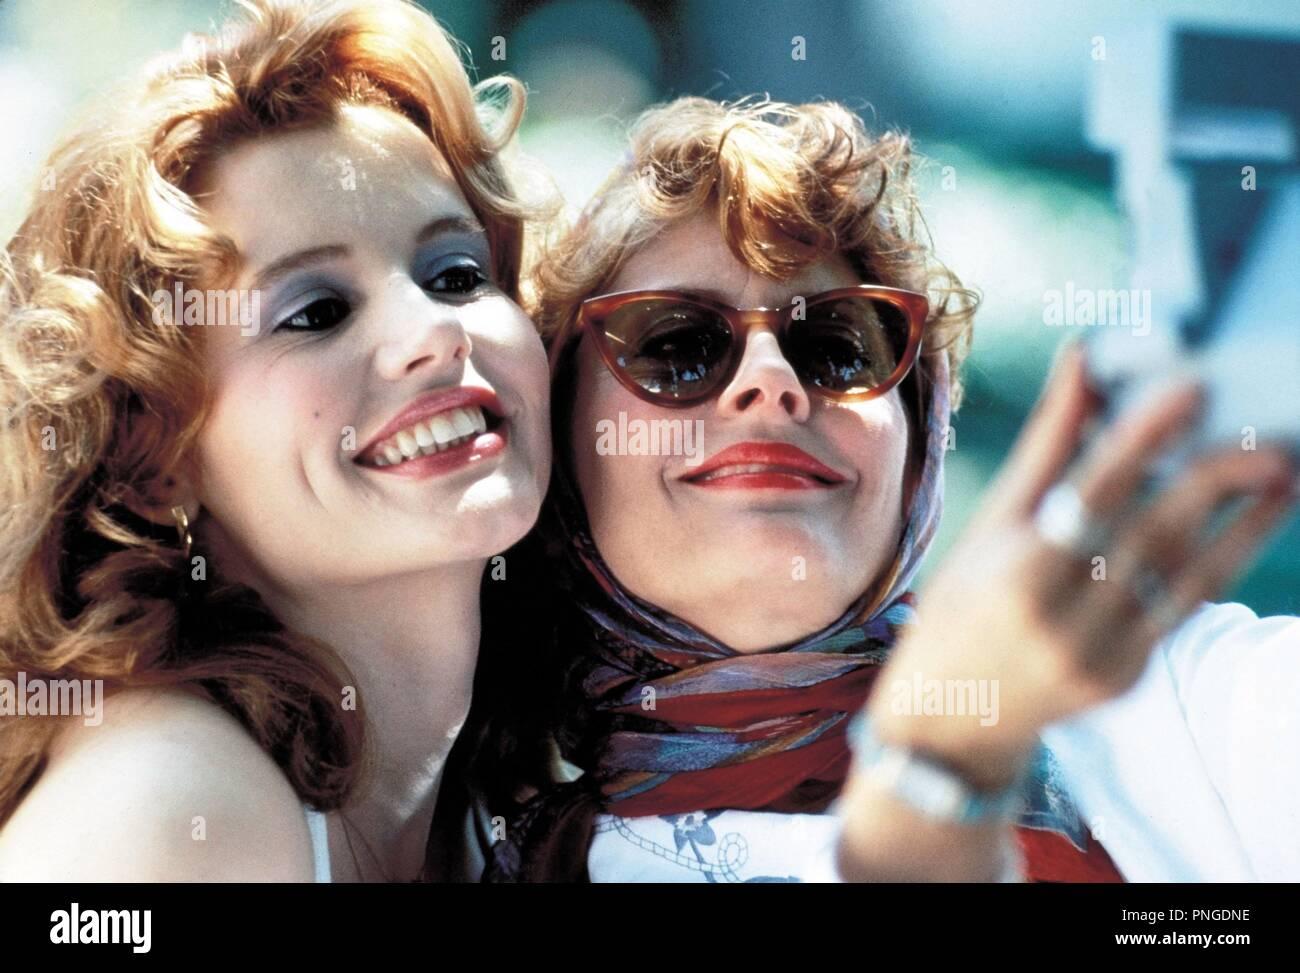 Susan Brown (American actress),Seika Kuze Hot video Russell Brand (born 1975),Annette Bening